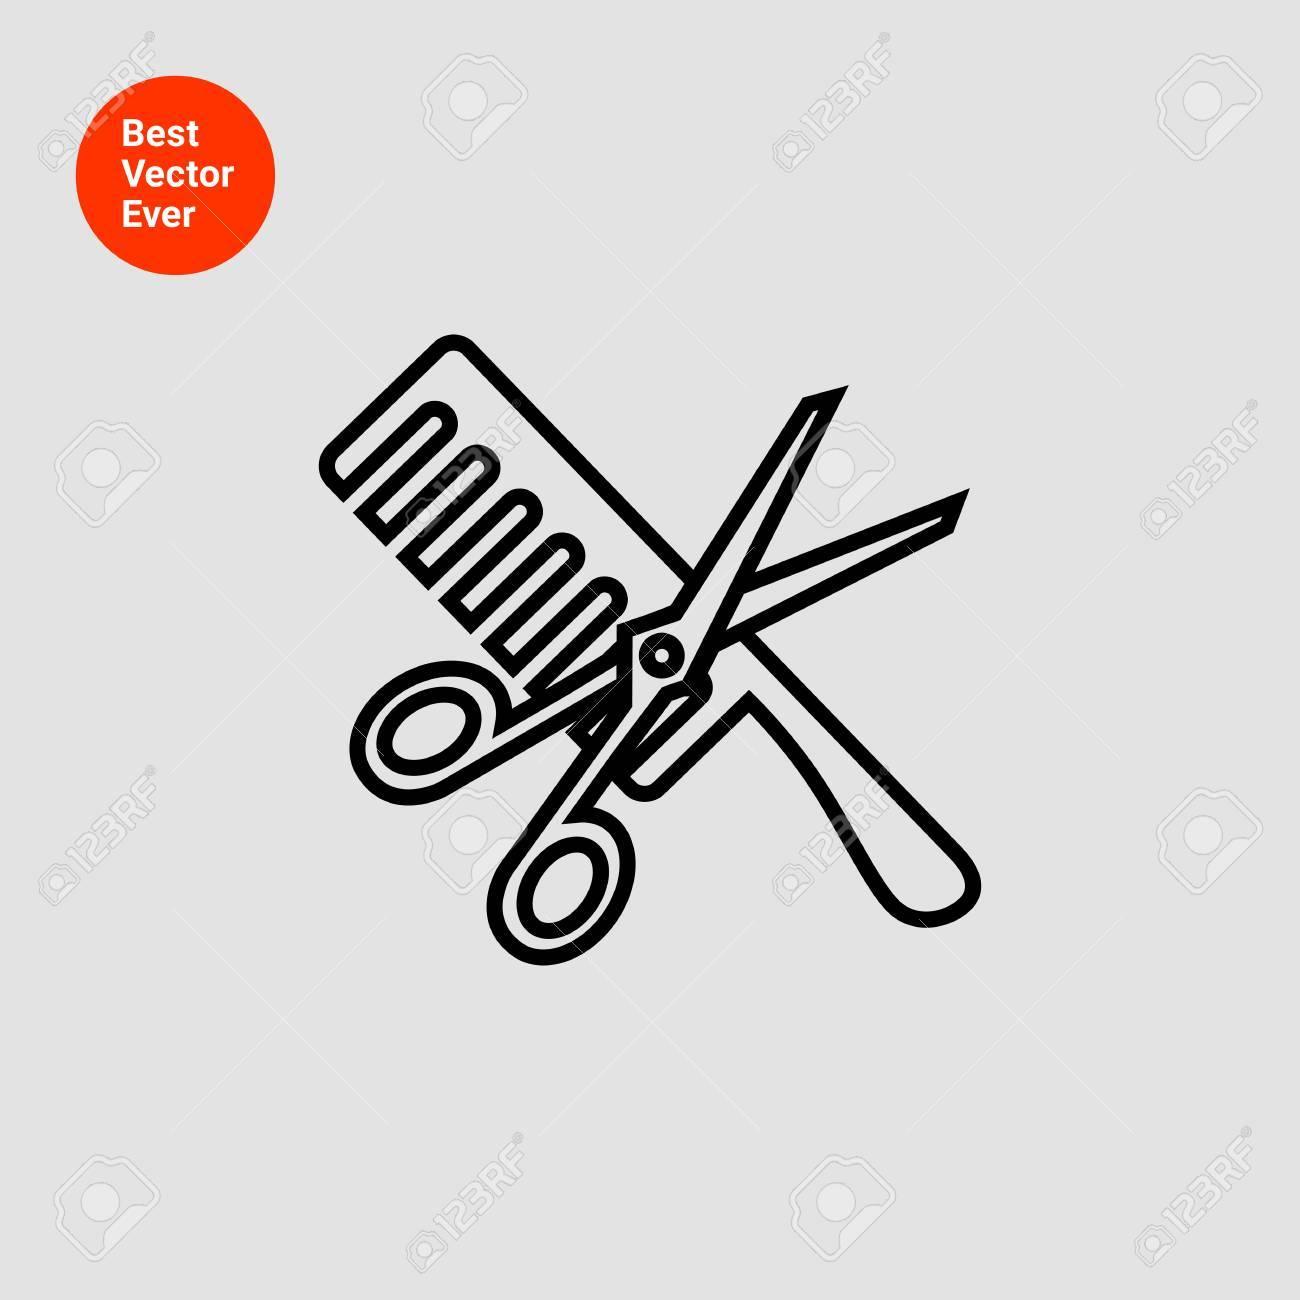 icon of crossed scissors and comb royalty free cliparts vectors rh 123rf com Scissor Knife Crossed Logos Open Scissors